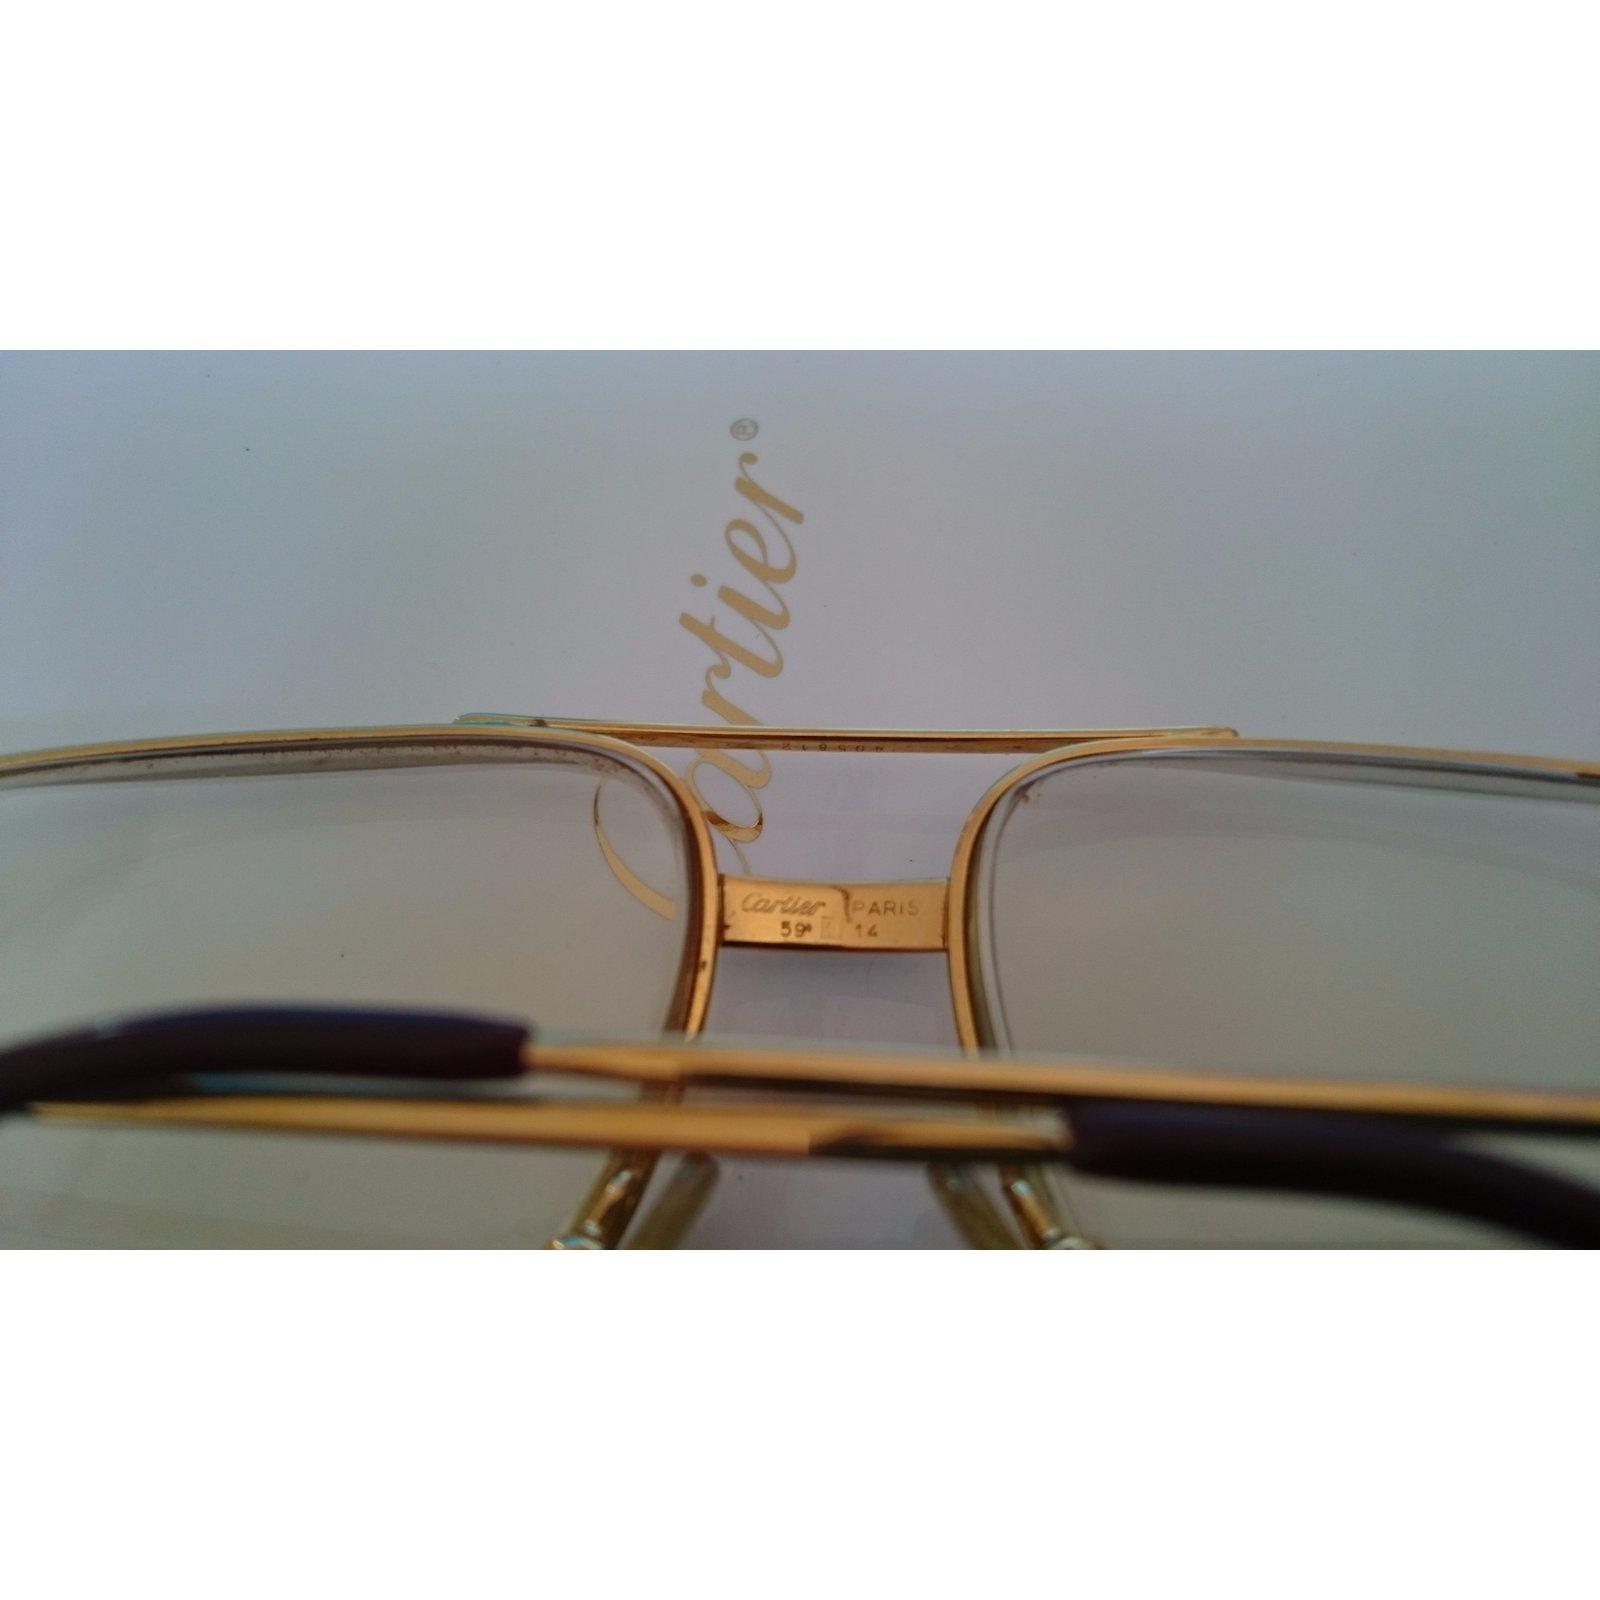 009d913063 Facebook · Pin This. Cartier Sunglasses Sunglasses Gold Golden ref.24504